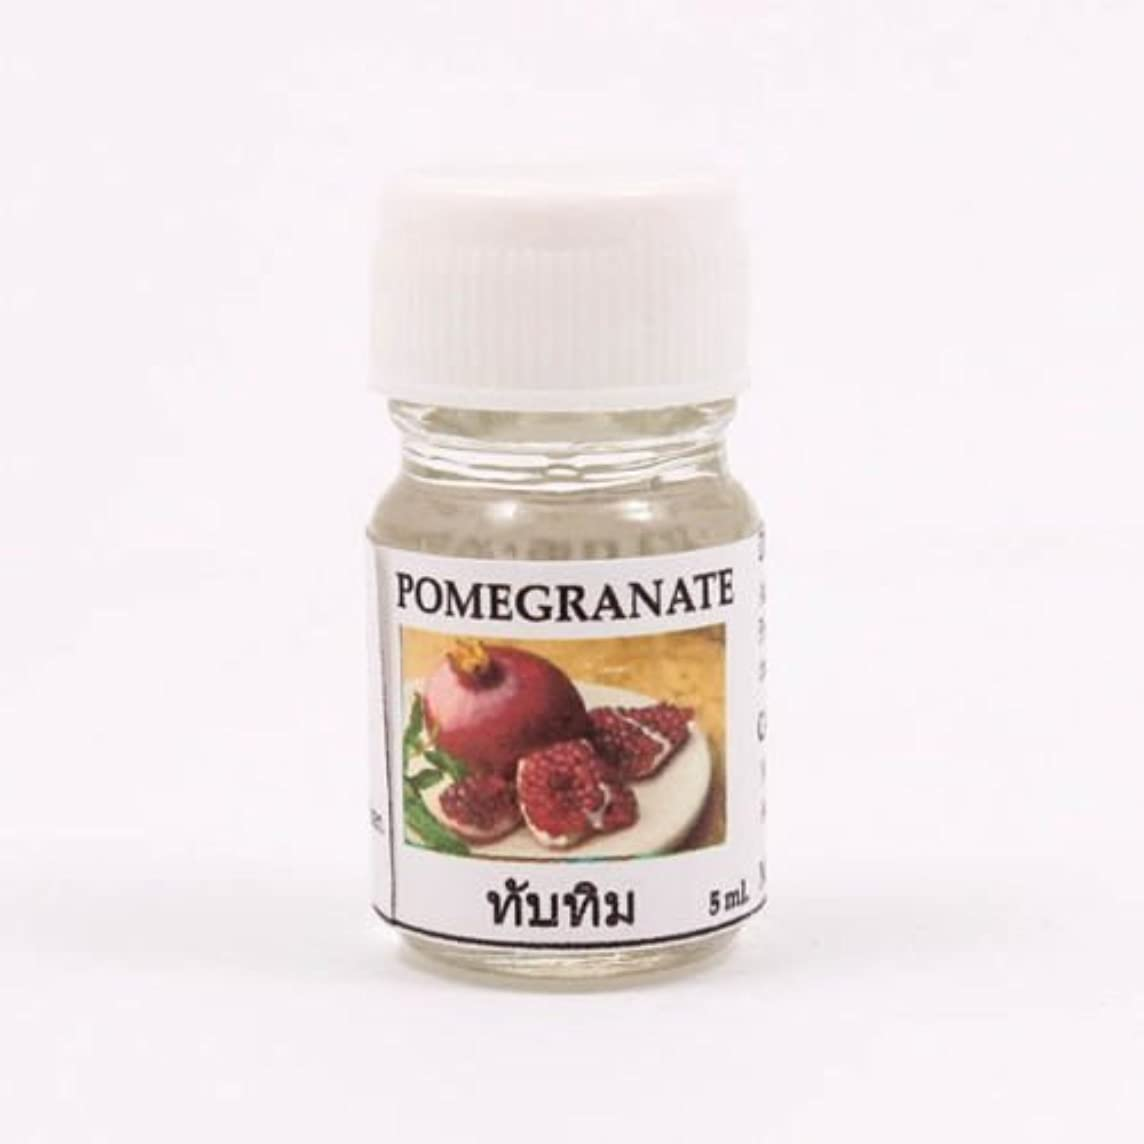 6X Pomegranate Aroma Fragrance Essential Oil 5ML Diffuser Burner Therapy